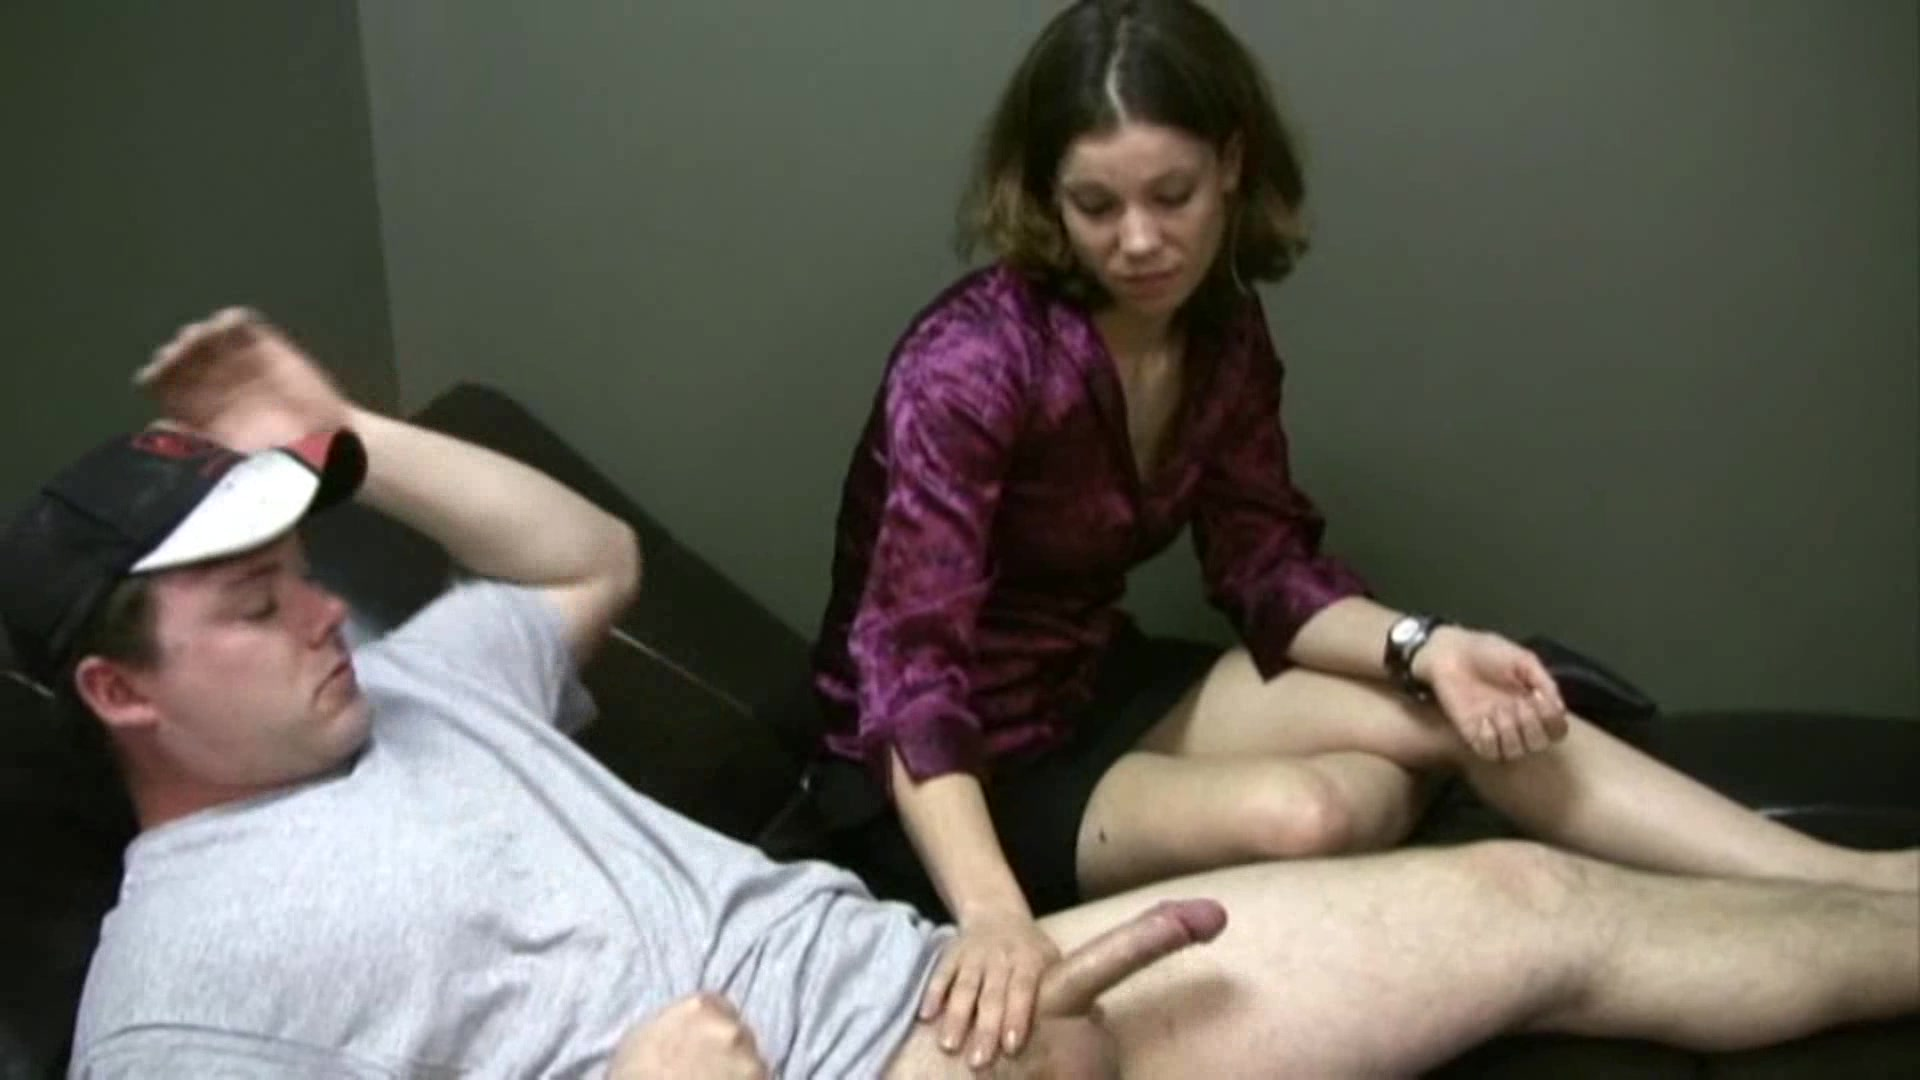 premature ejaculation videos